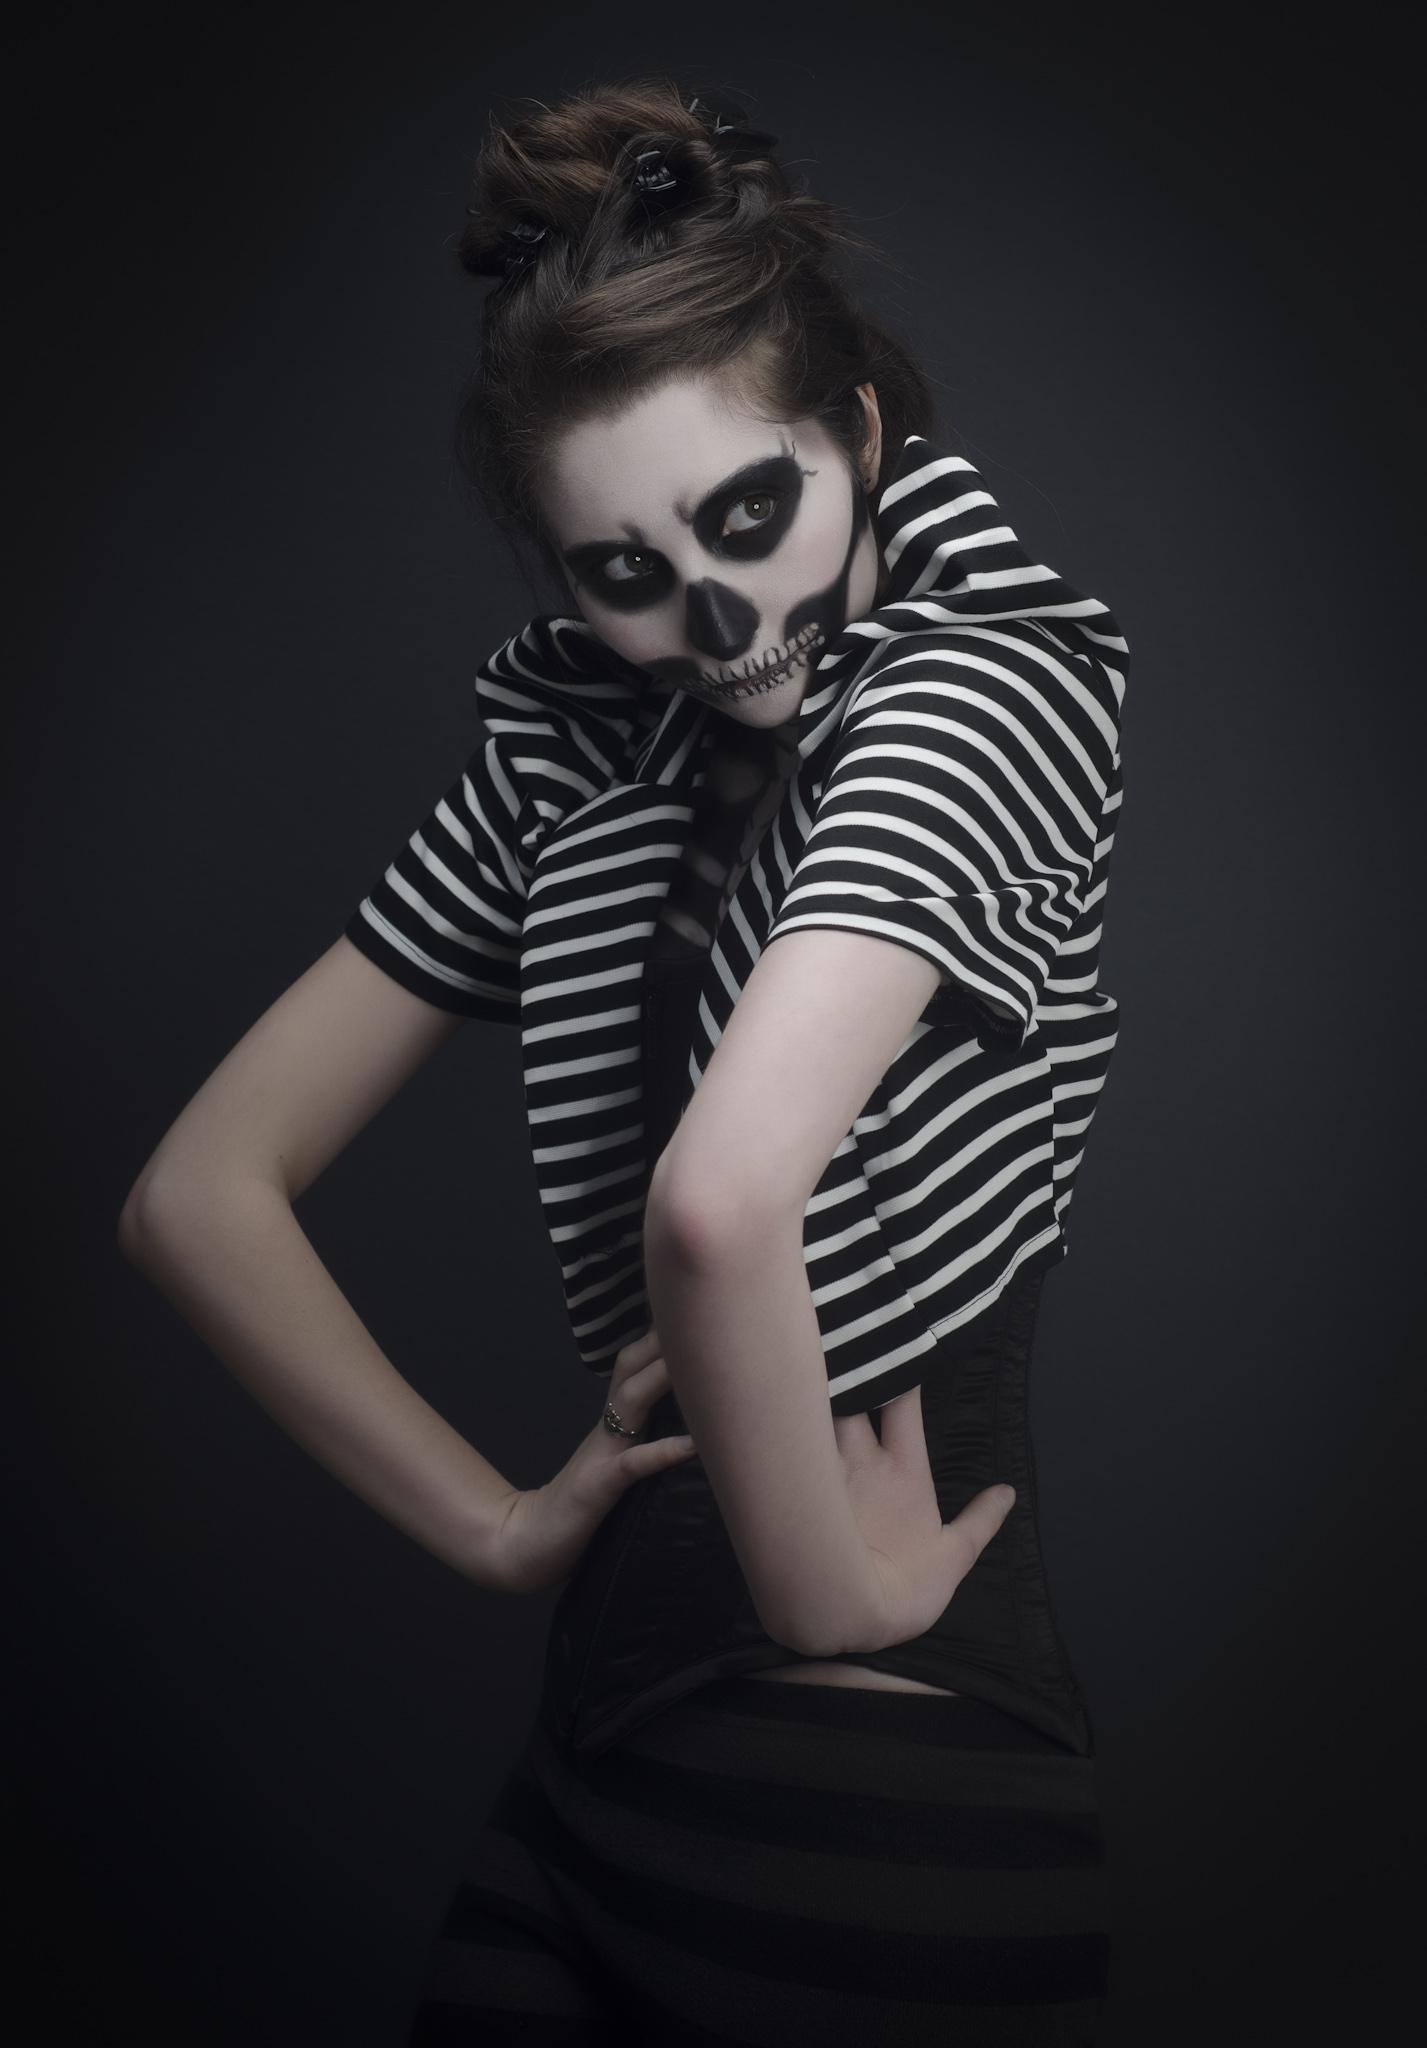 Rick McZany Photography (Rick McQuinian - Demolita Mortier - makeup Dominique Weir